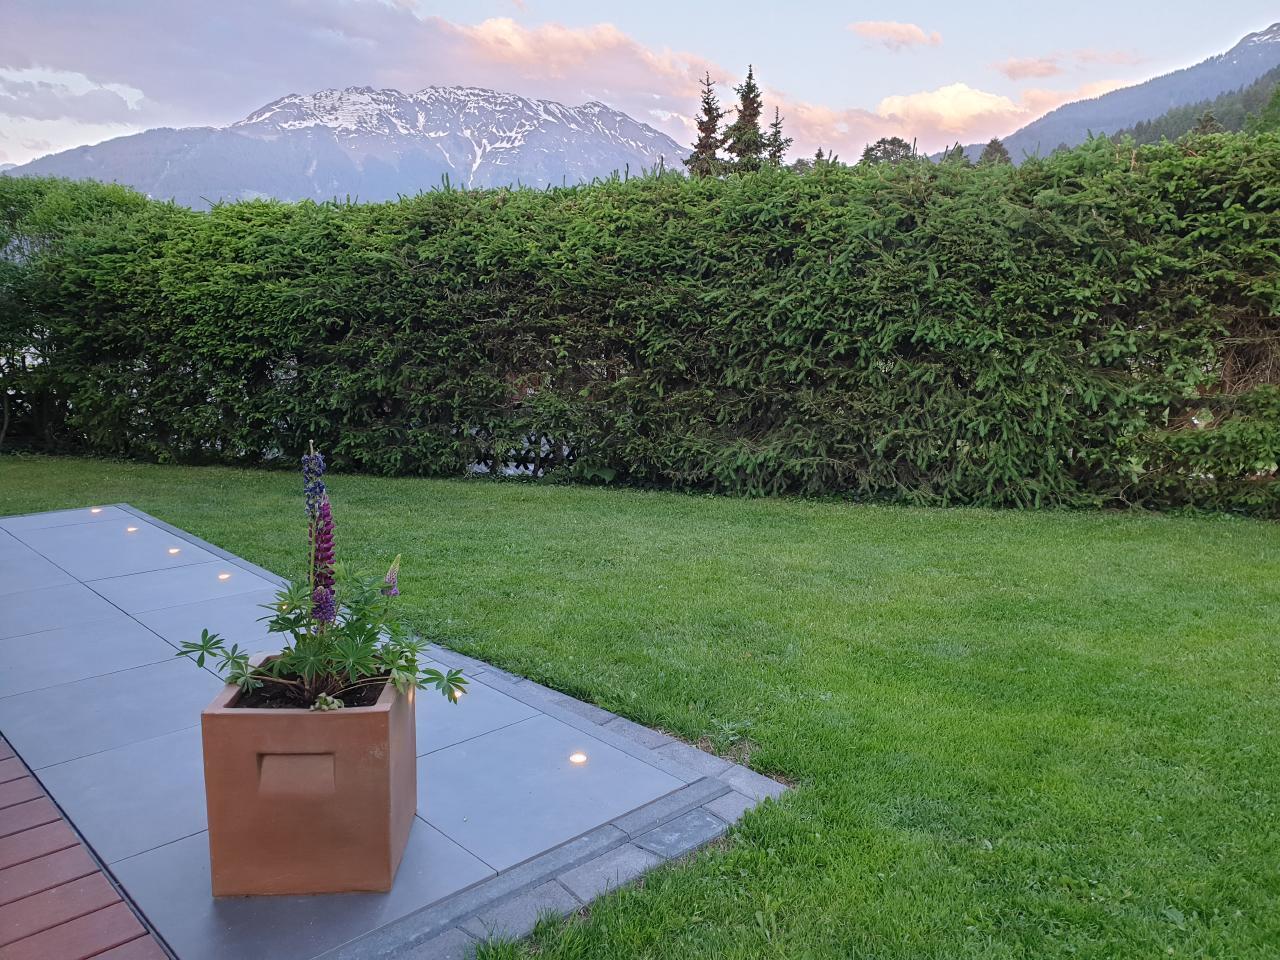 Holiday house Klaas (294495), Tschagguns, Montafon, Vorarlberg, Austria, picture 6